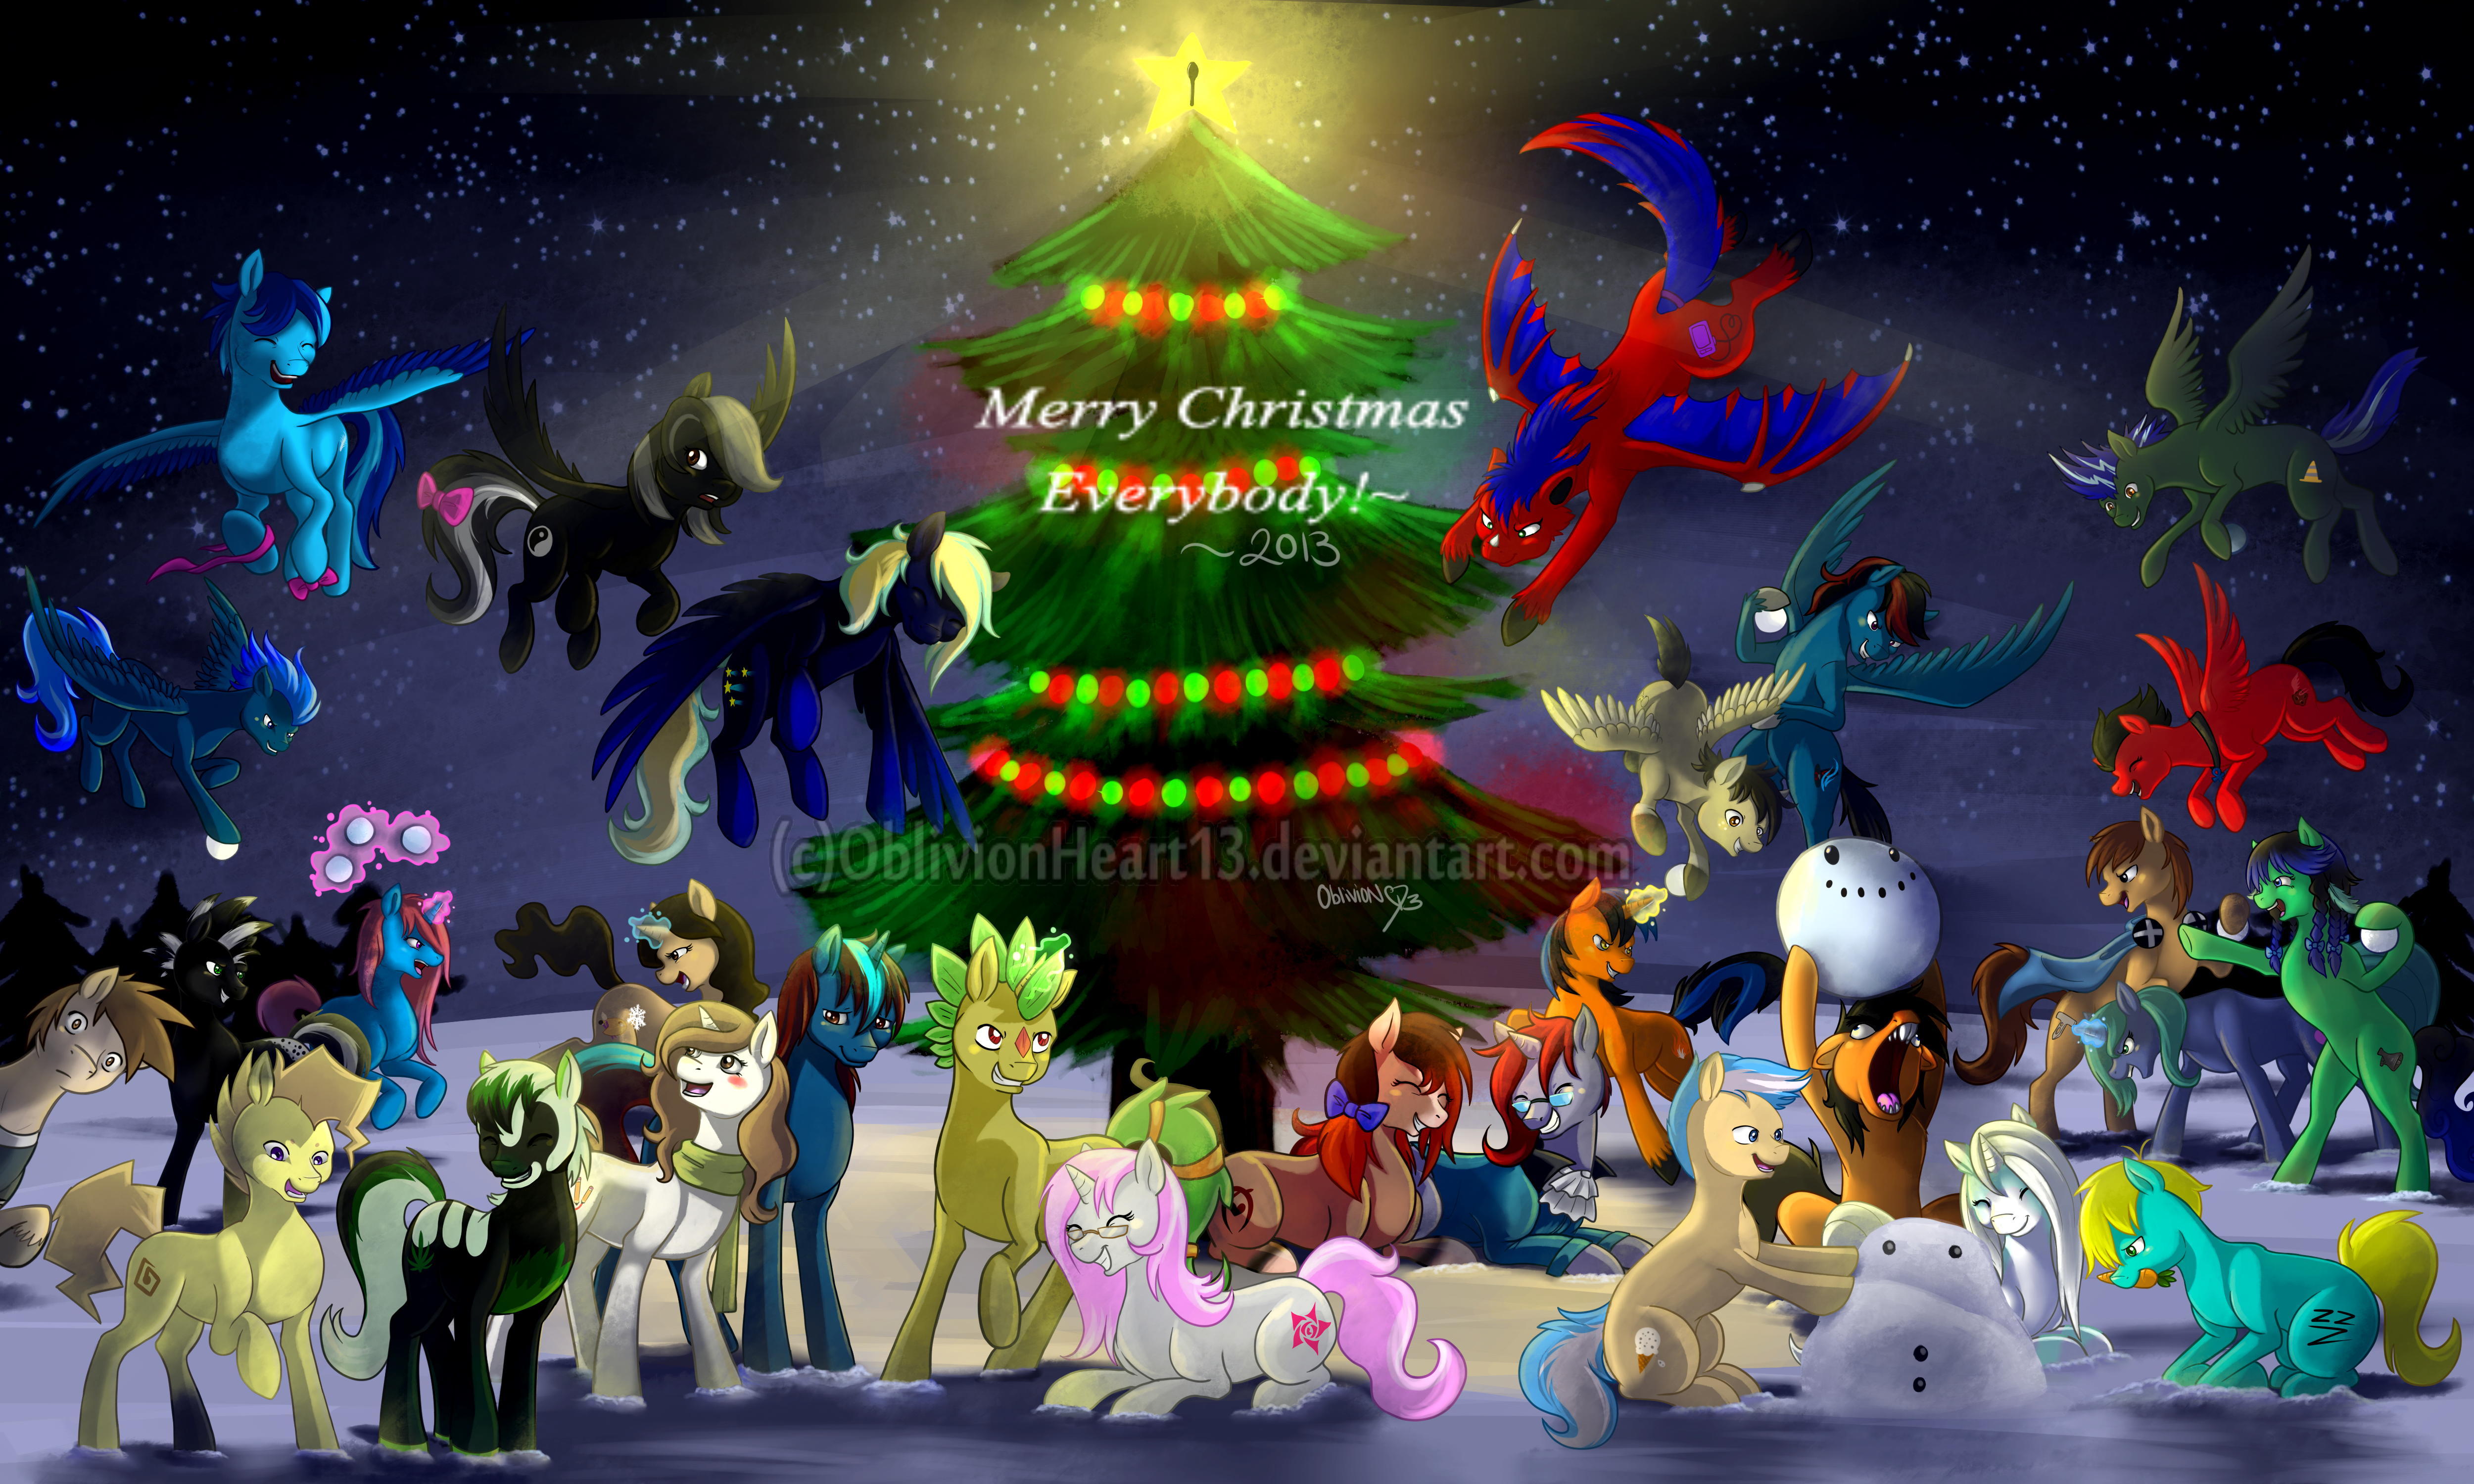 A Pikapetey Christmas 2013 by OblivionHeart13